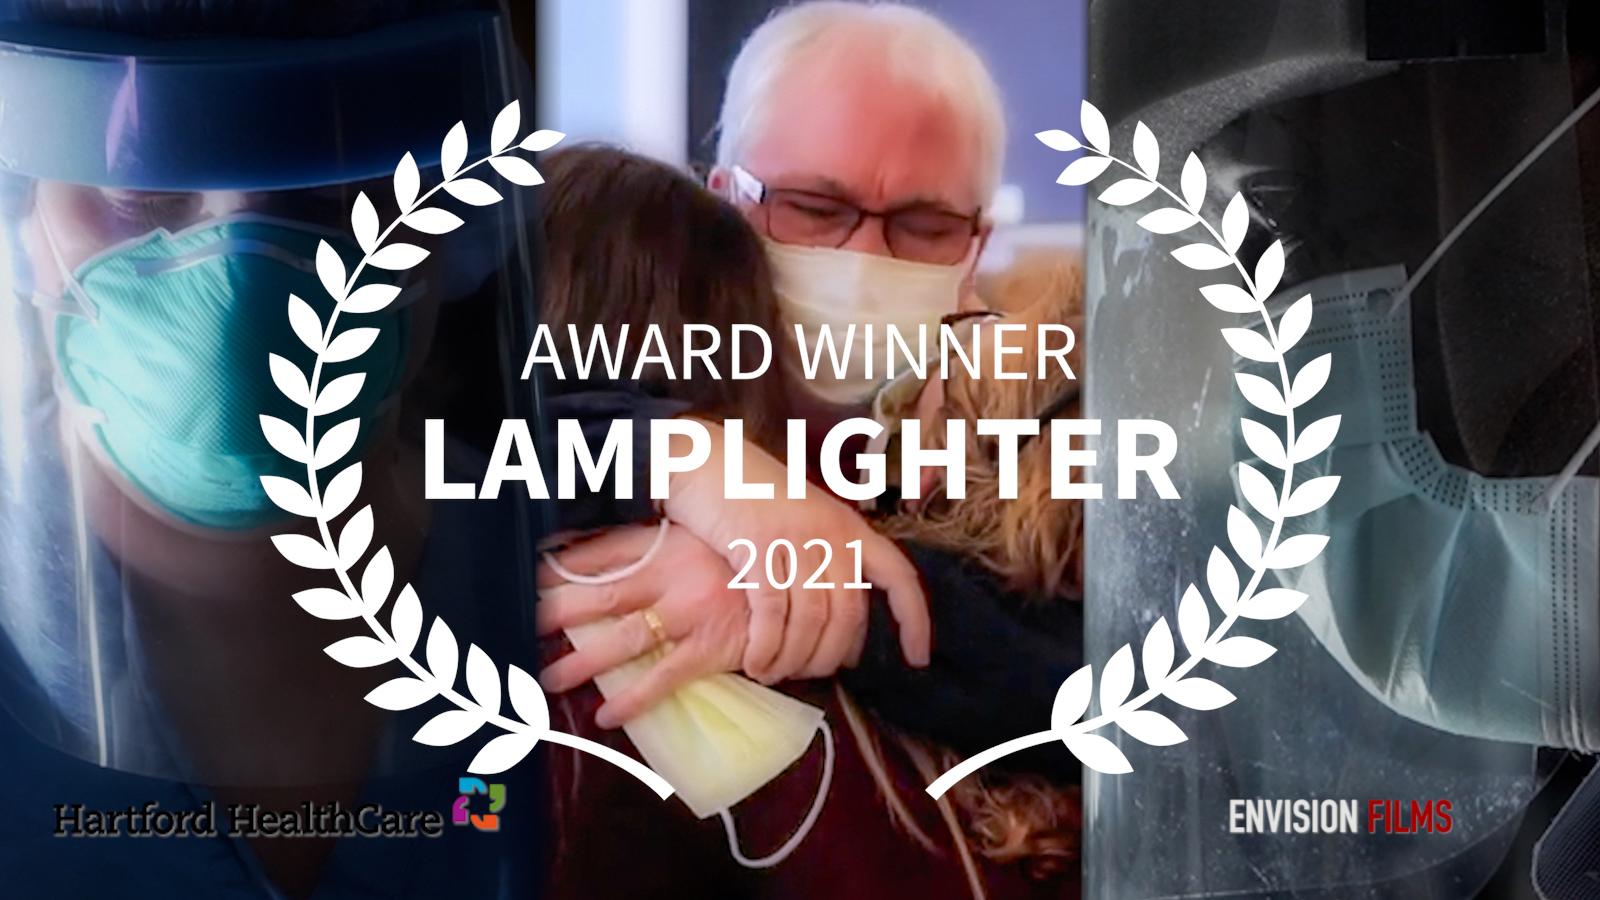 Jeffrey Teitler, Rebecca Stewart, Nick Dethlefsen and Hartford HealthCare win Lamplighter